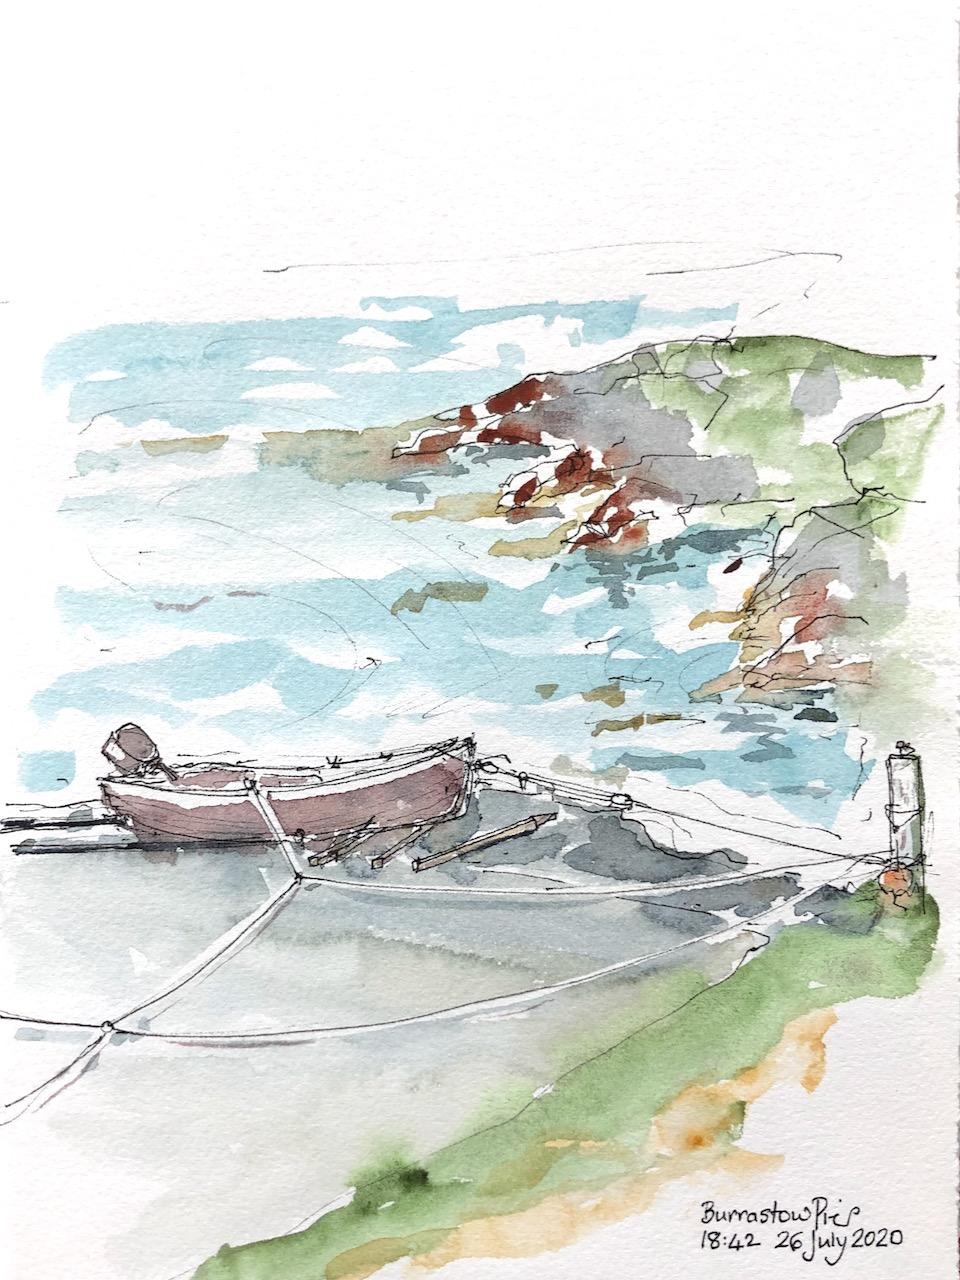 Shetland: Burrastow beach andpier